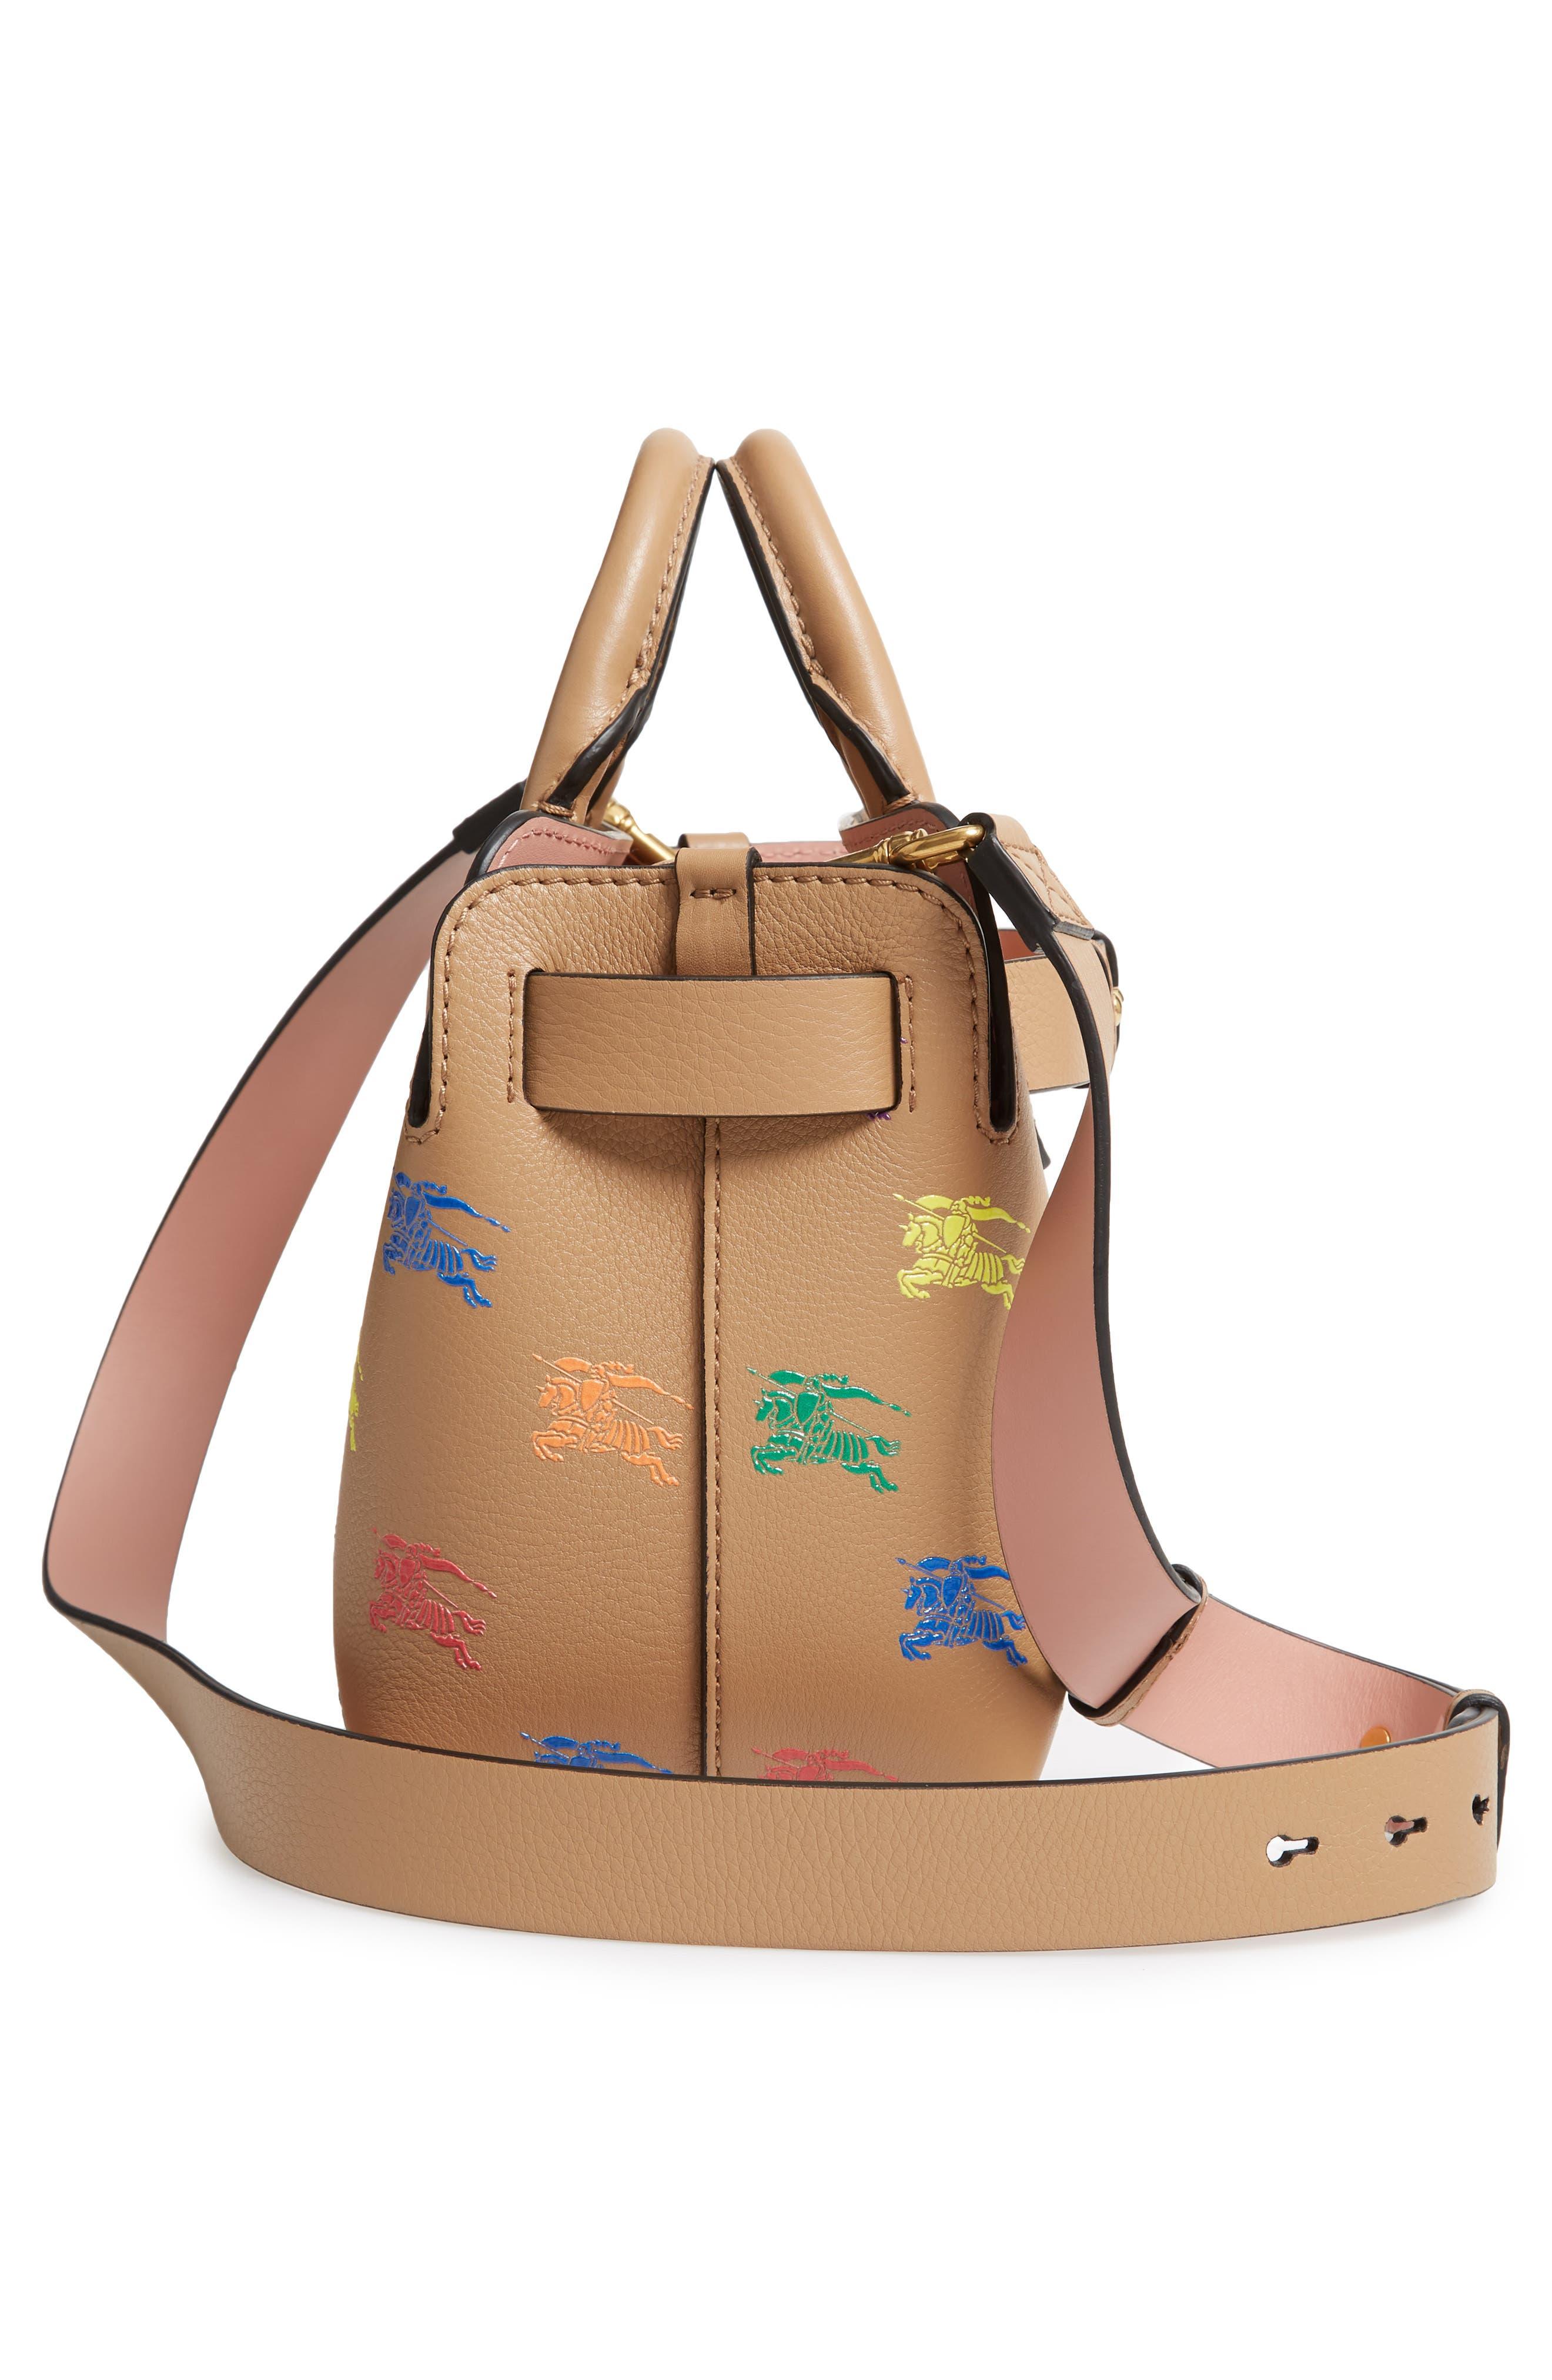 Baby Belt Bag Rainbow Logo Leather Tote,                             Alternate thumbnail 5, color,                             LIGHT CAMEL